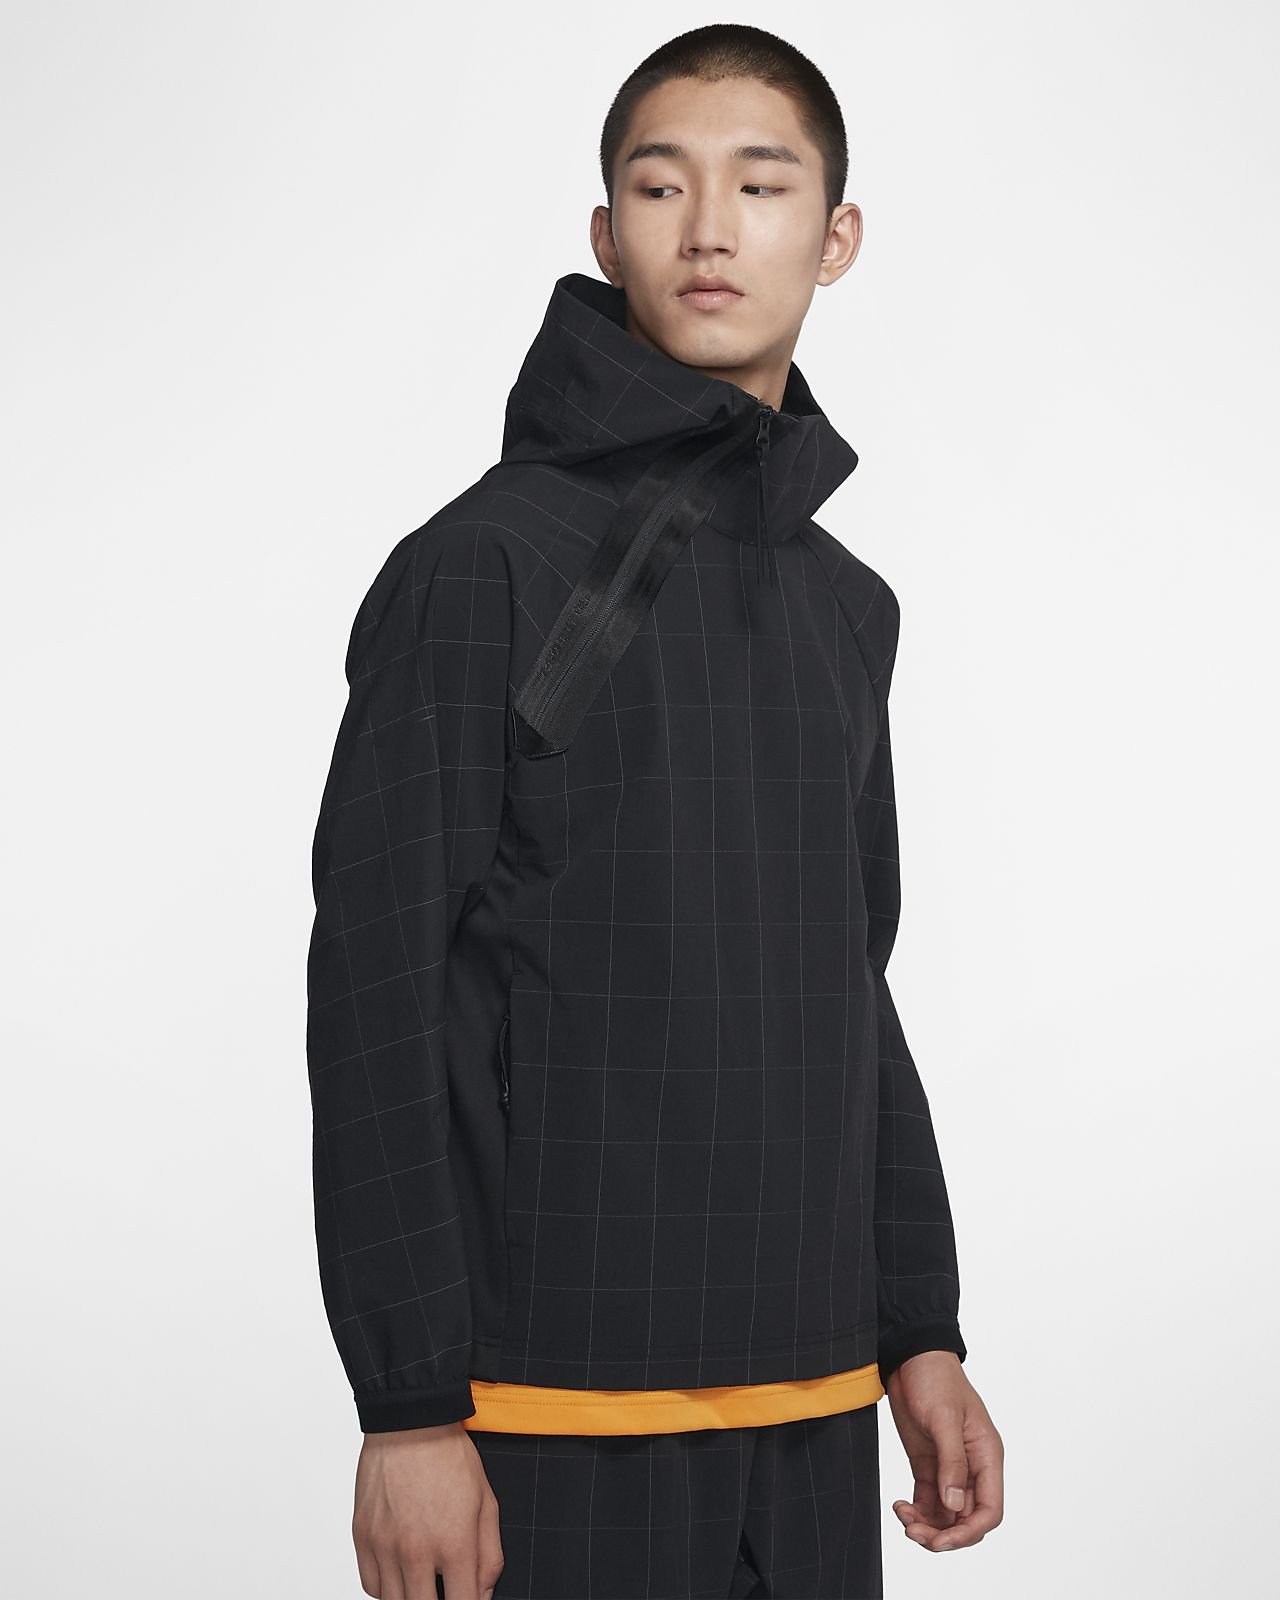 Nike Sportswear Tech Pack 男子连帽梭织上衣